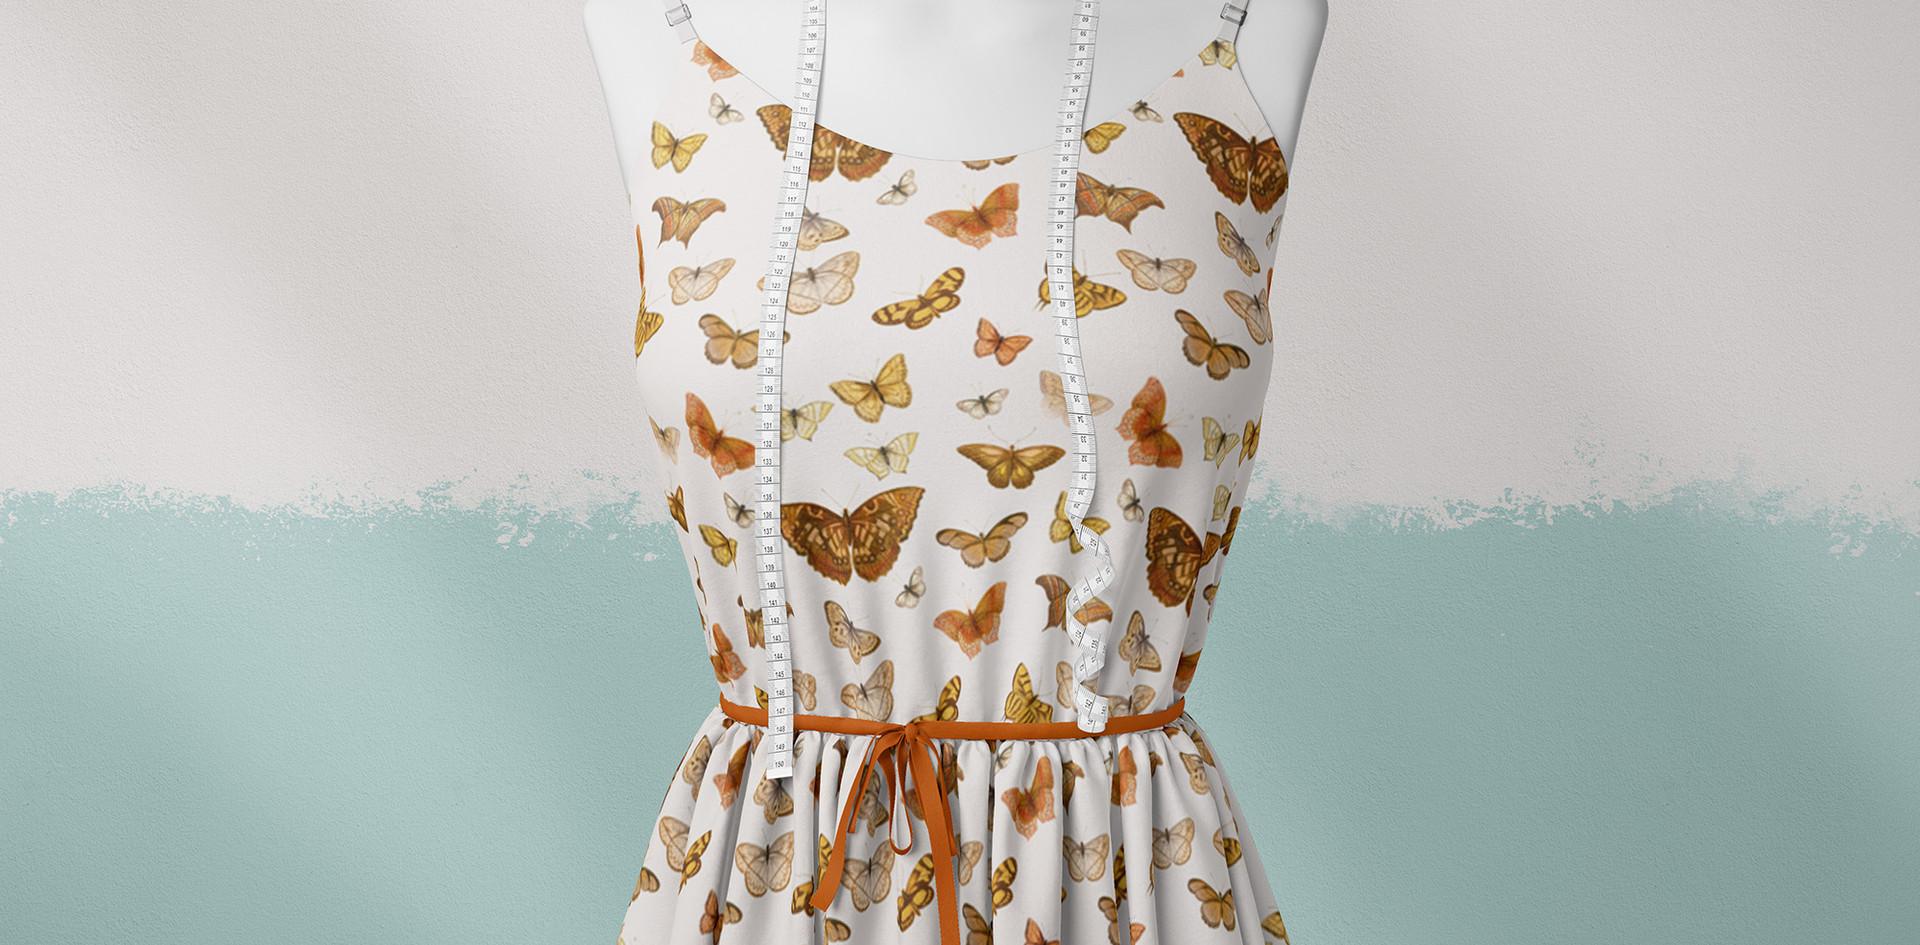 Dressmaking fabrics